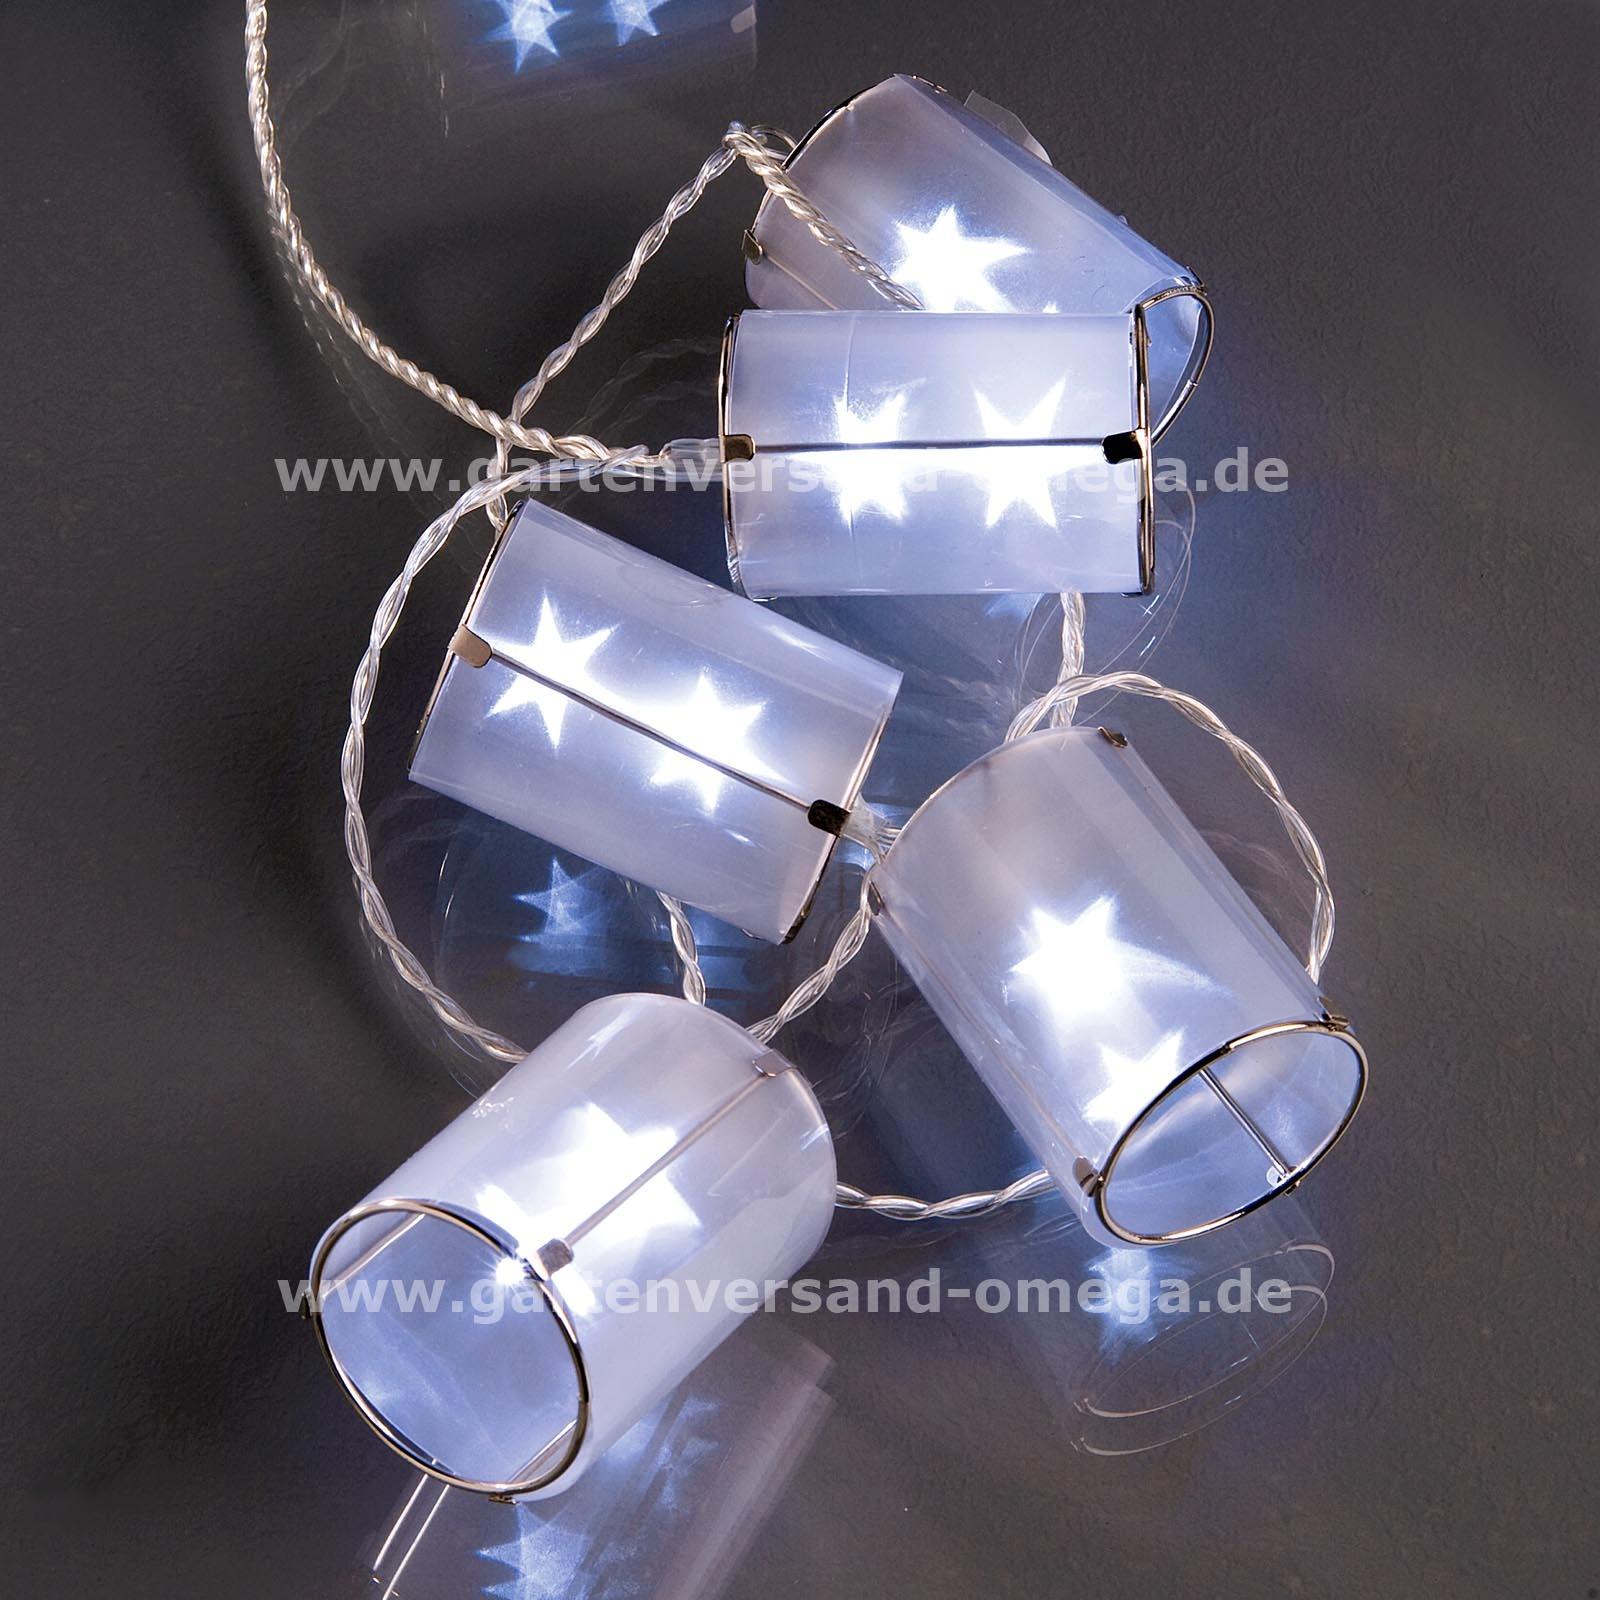 2605669-led-lichterkette-holografie-laternenhd-large Spannende Led Lichterketten Mit Batterie Dekorationen